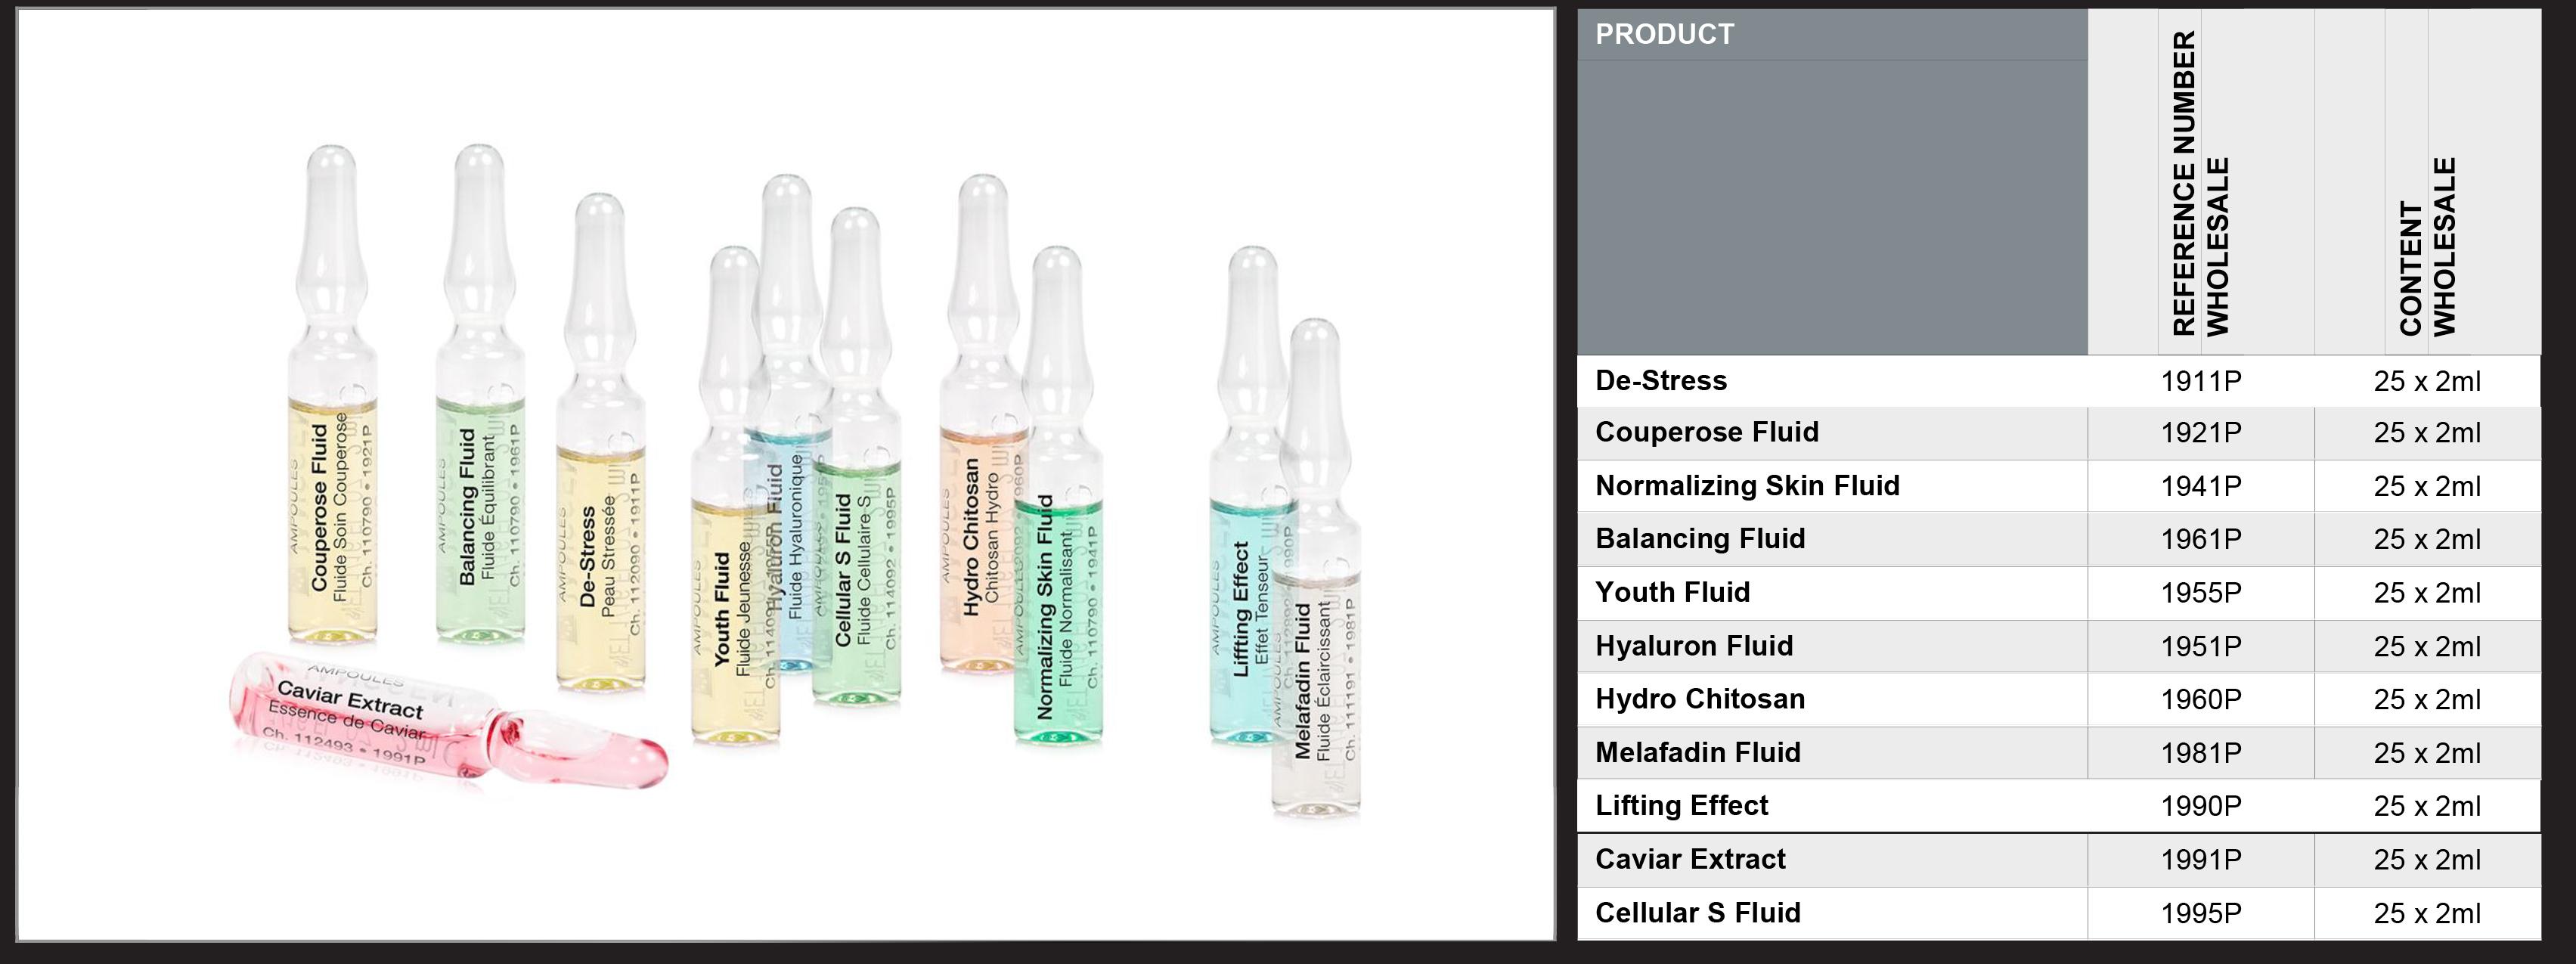 Lifestyle Aesthetics_Janssen Cosmetics (8)